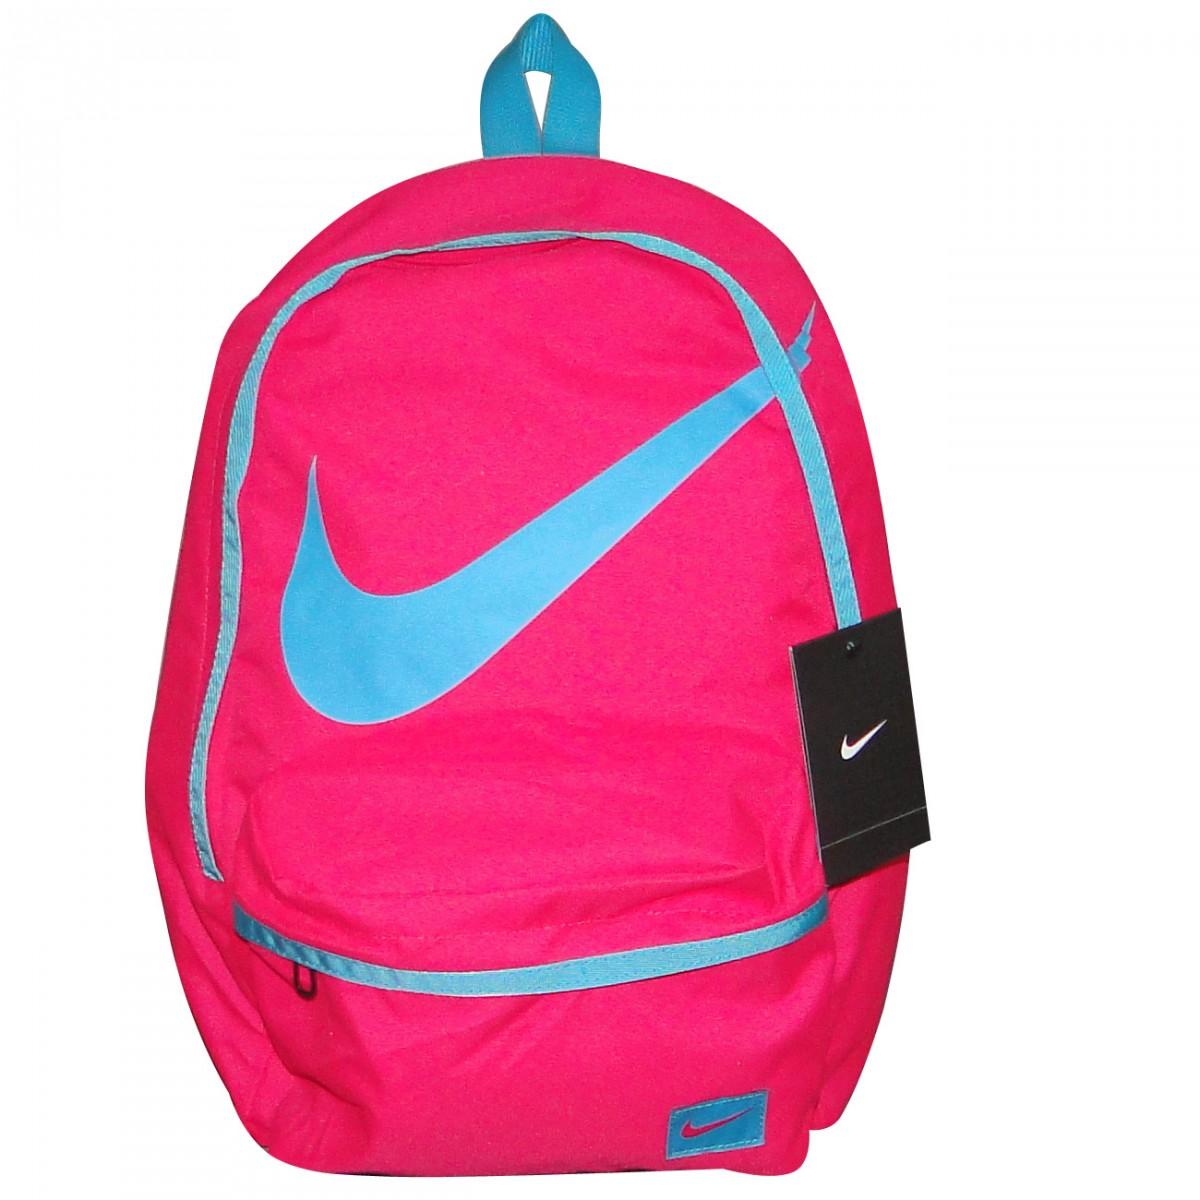 Bolsa De Viagem Da Nike Feminina : Mochila nike ref ba  pink azul chuteira